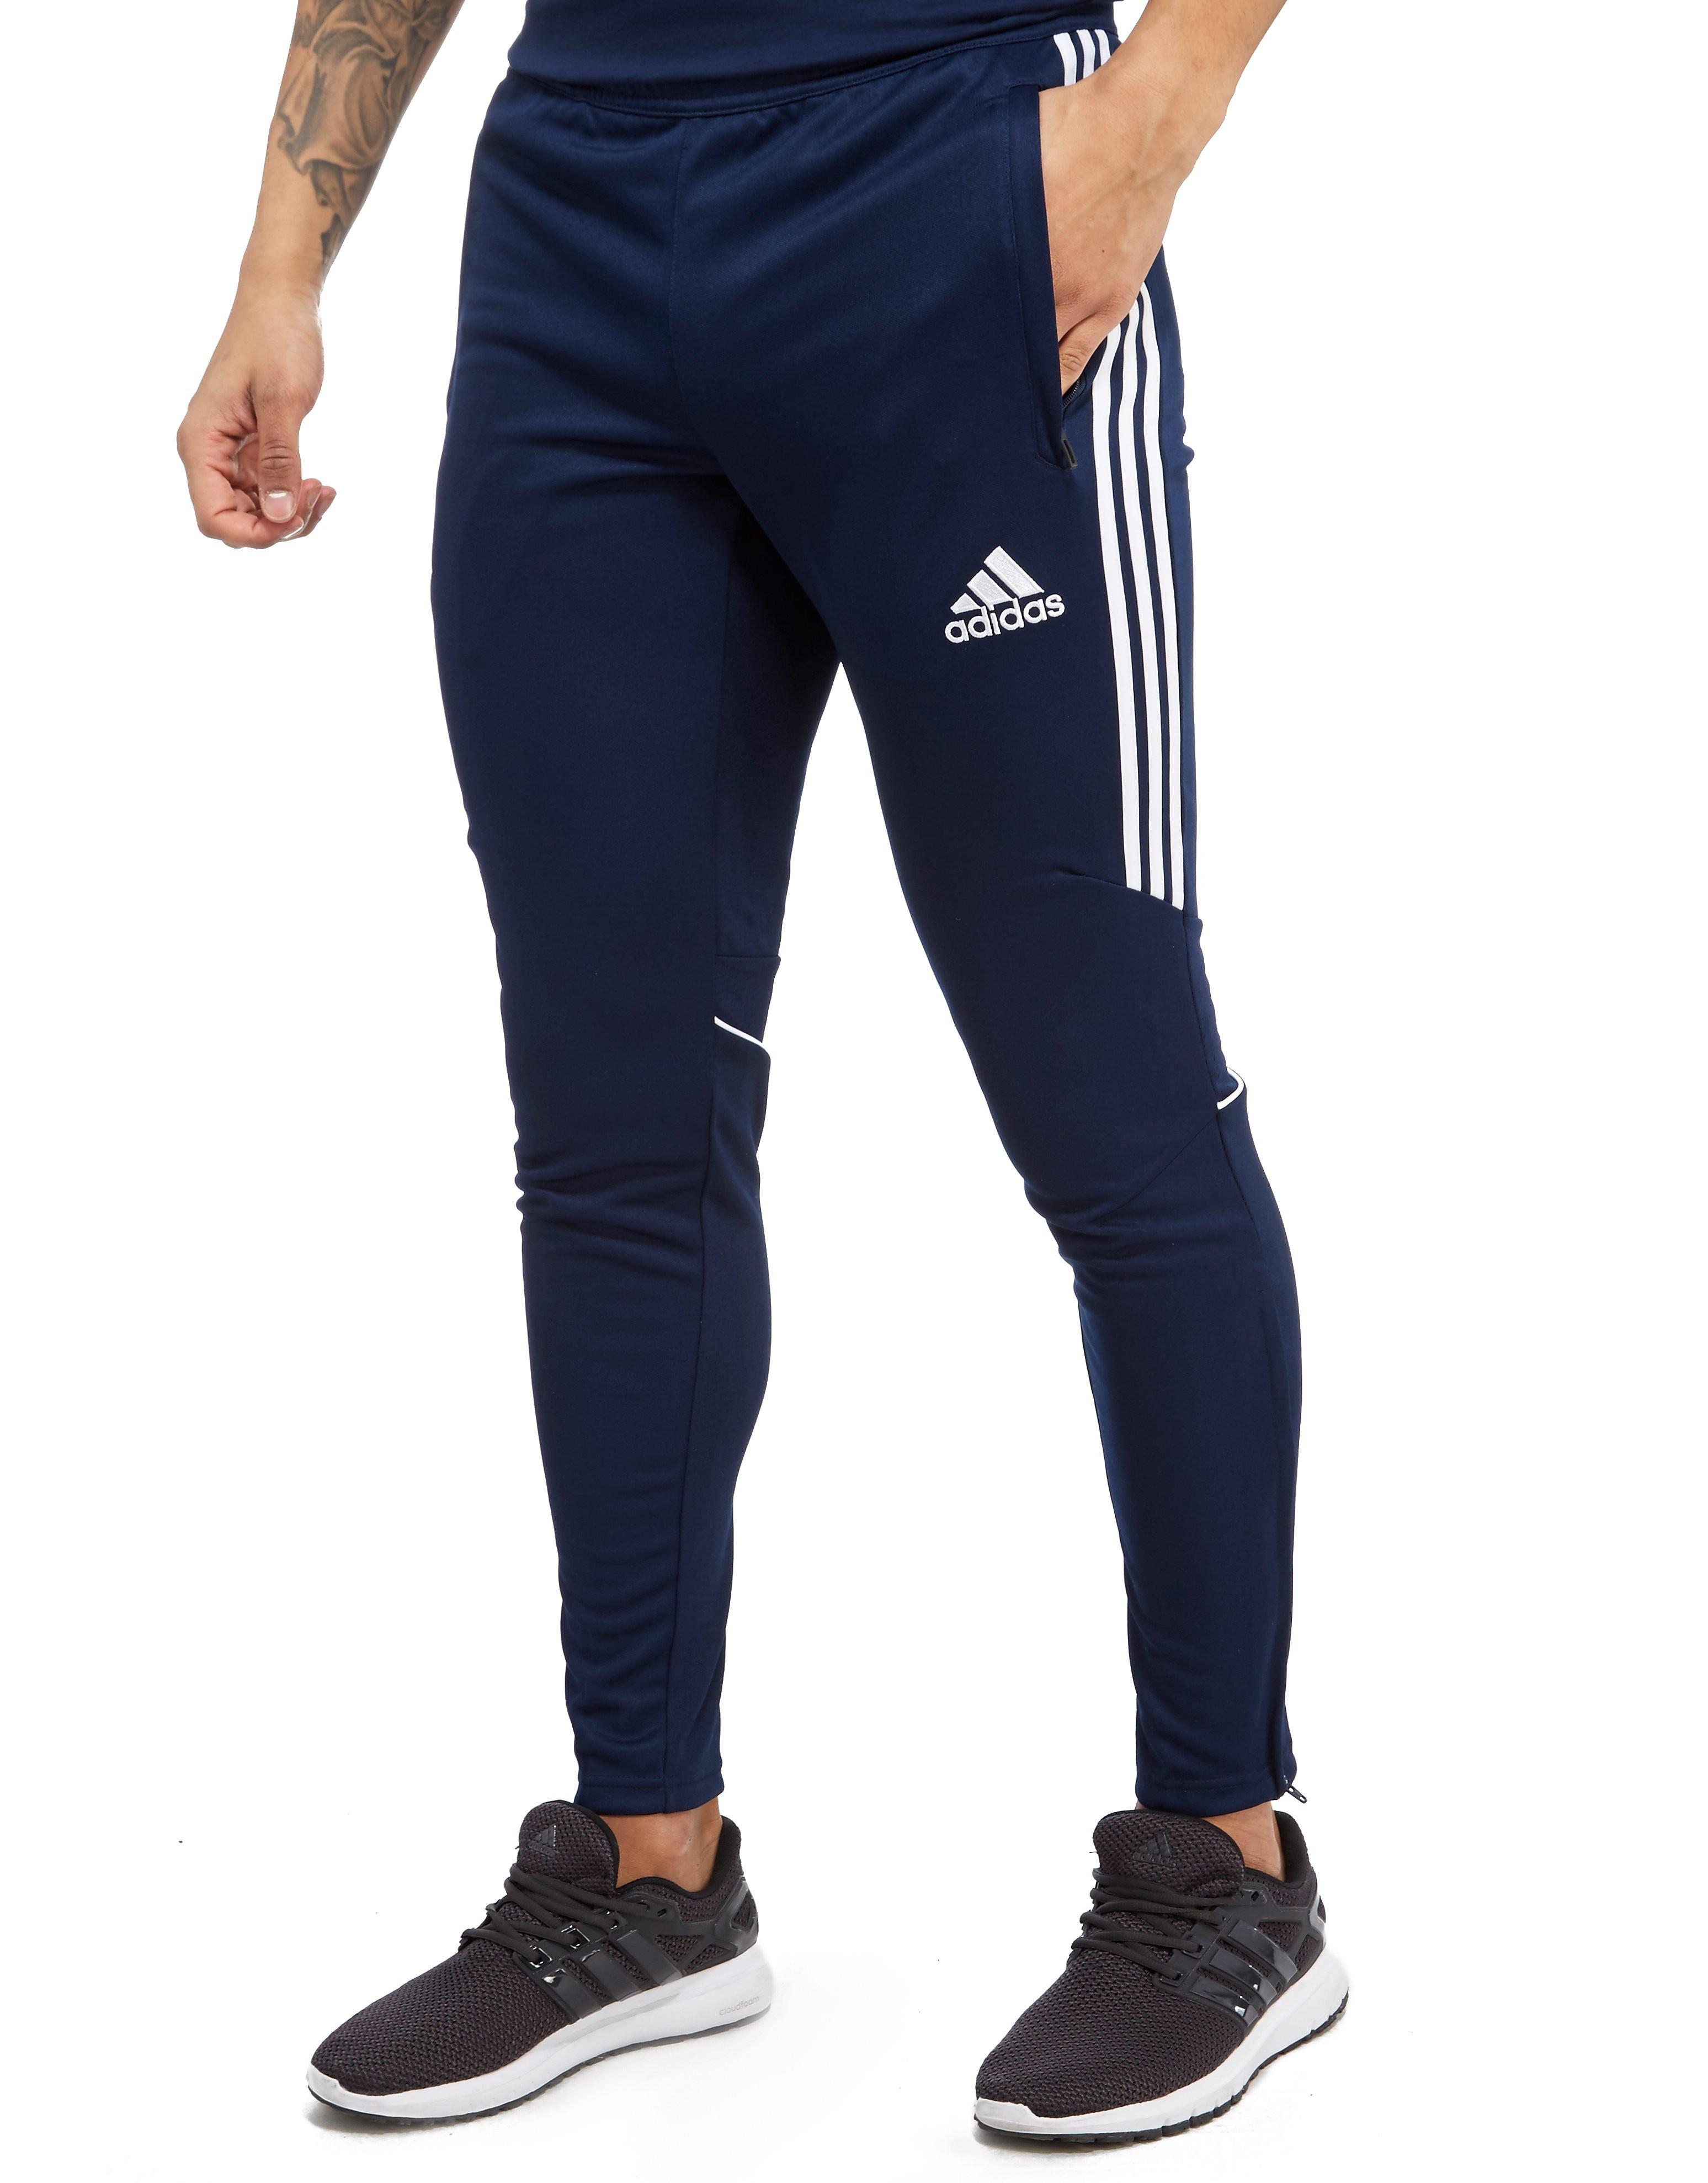 adidas Tango Pants